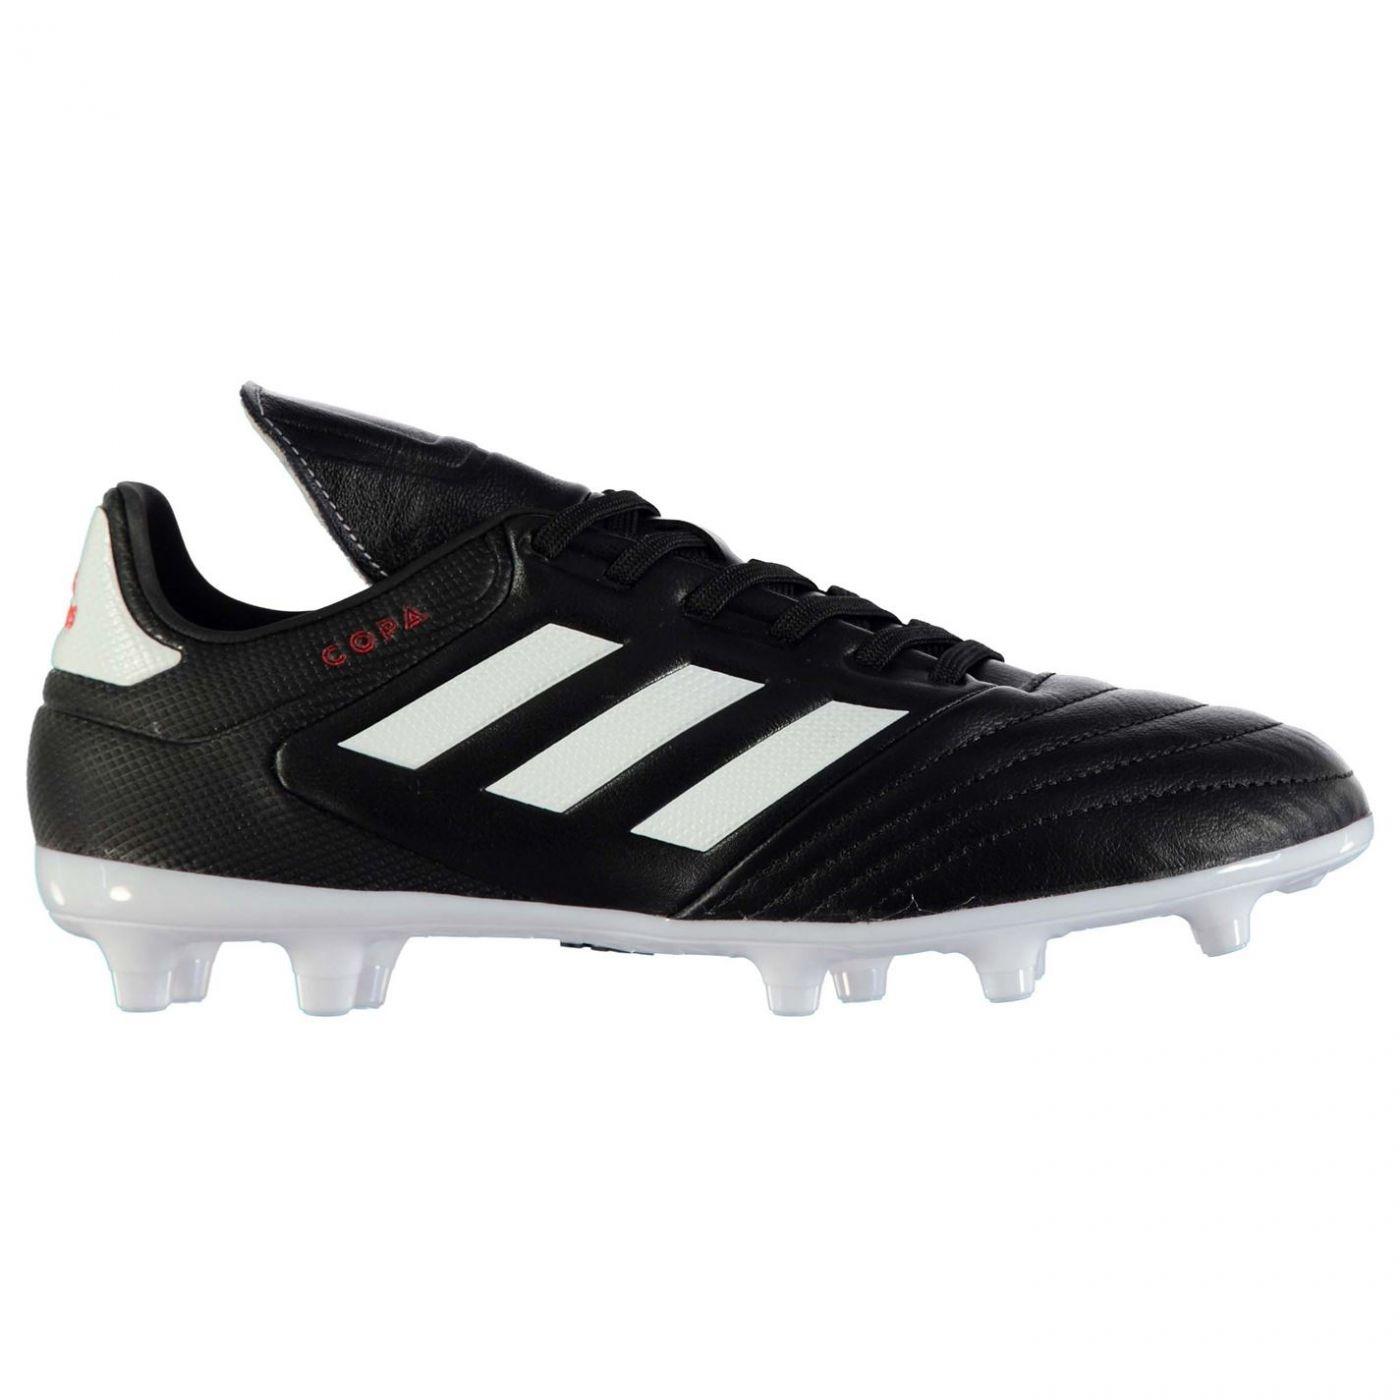 Adidas Copa 17.3 FG Mens Football Boots